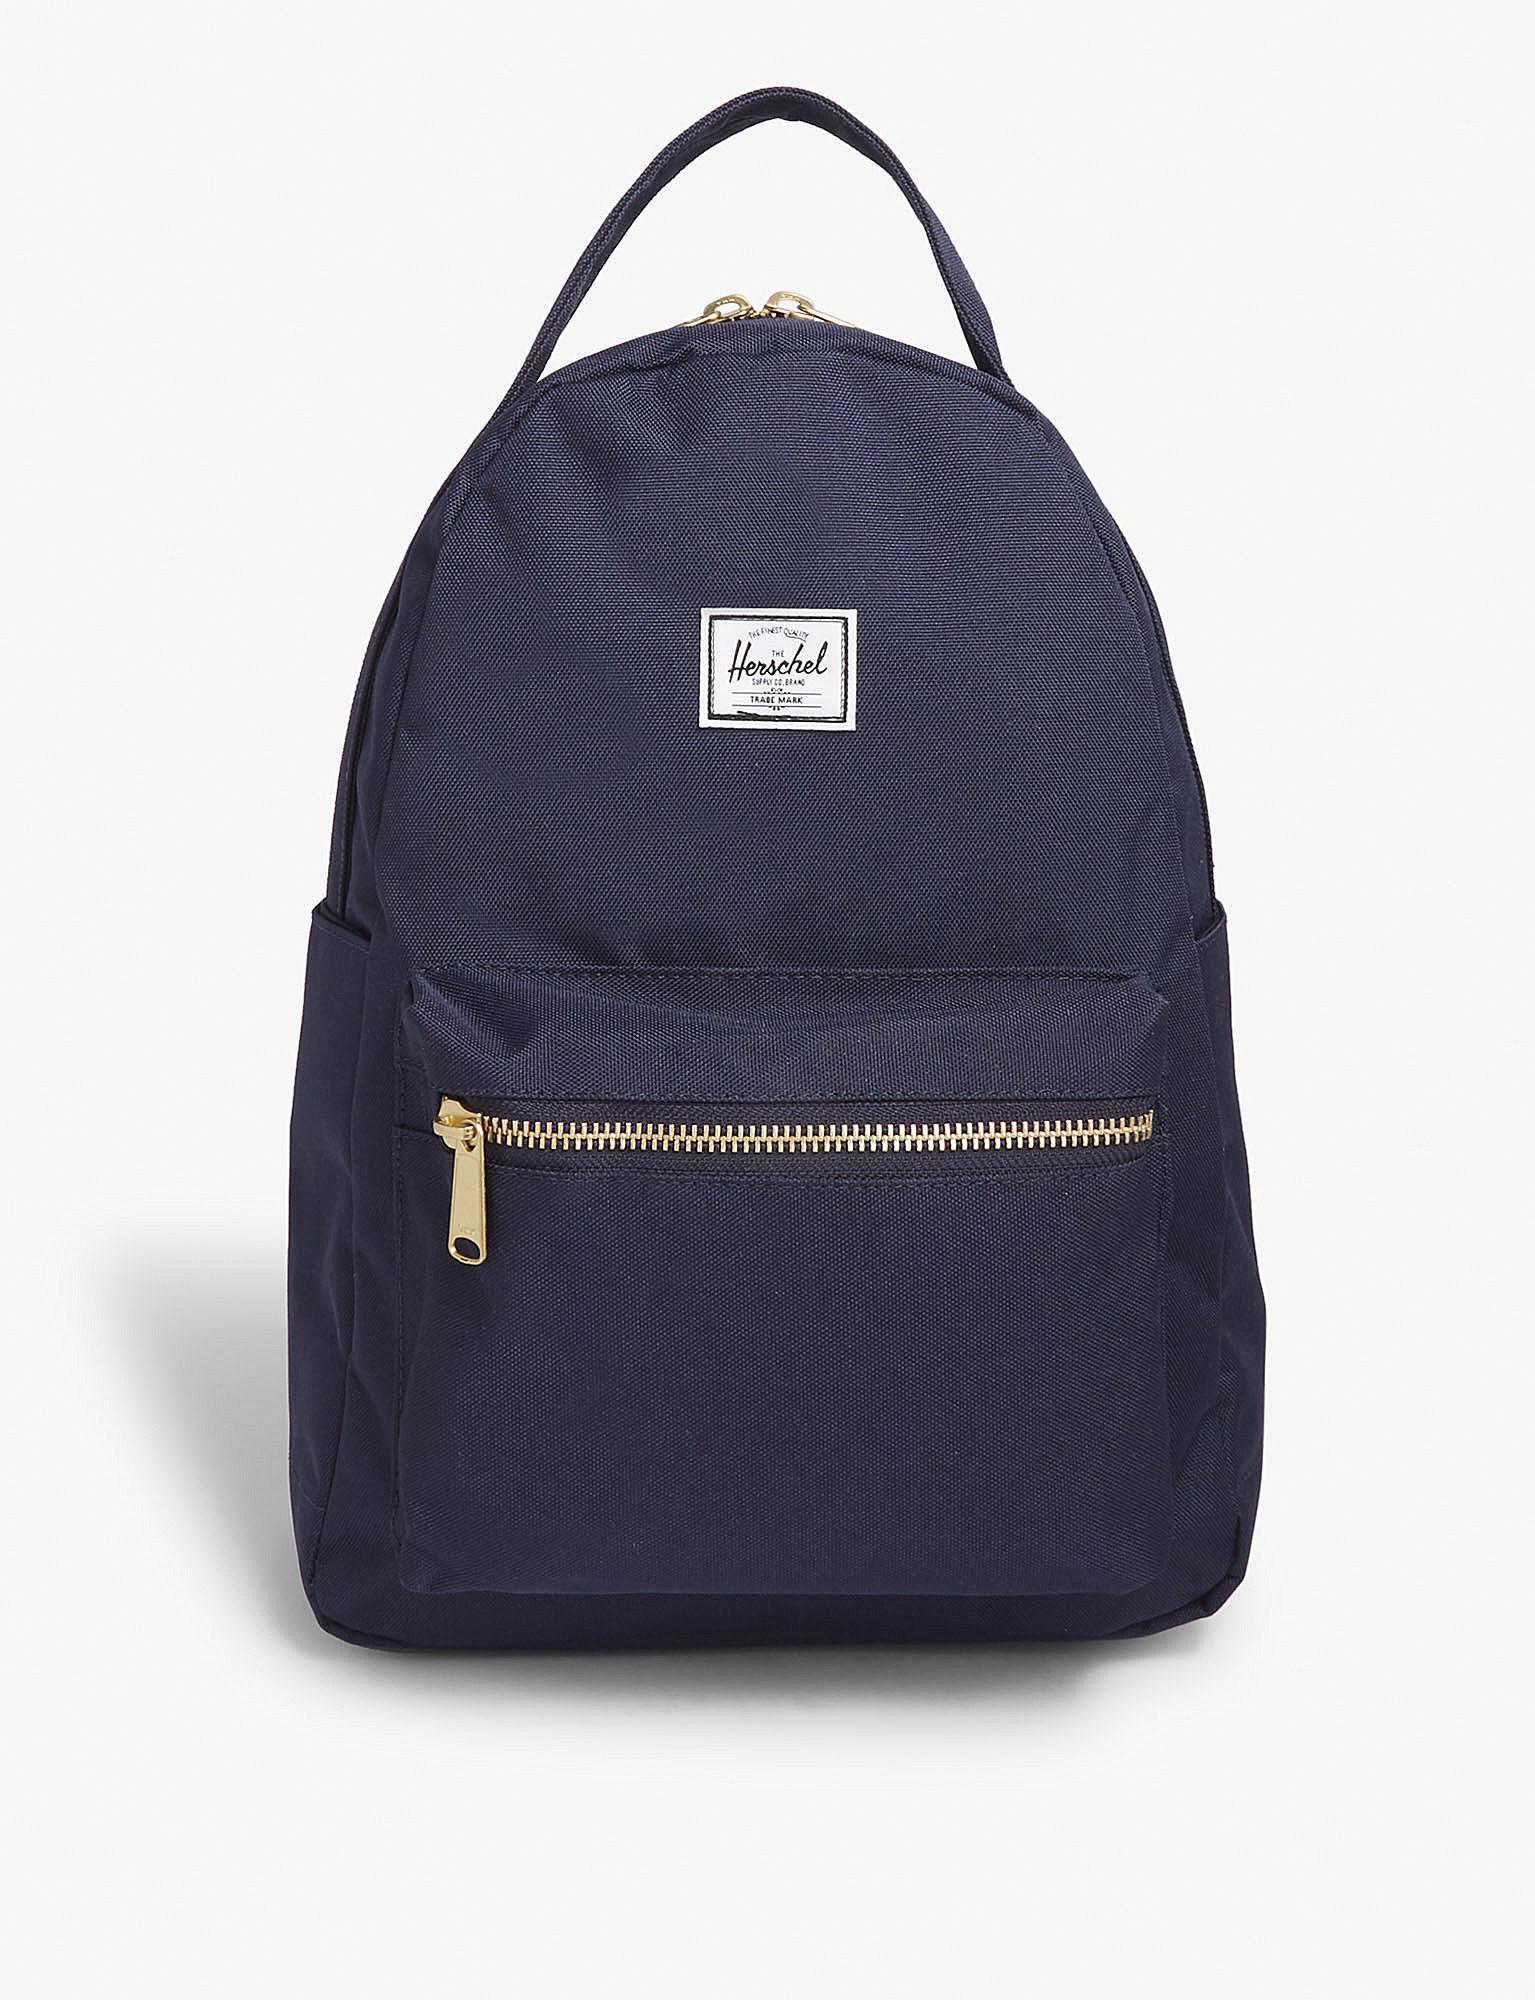 bd6c2c2ade Herschel Supply Co. . Peacoat Dark Blue Nova Backpack in Blue - Lyst